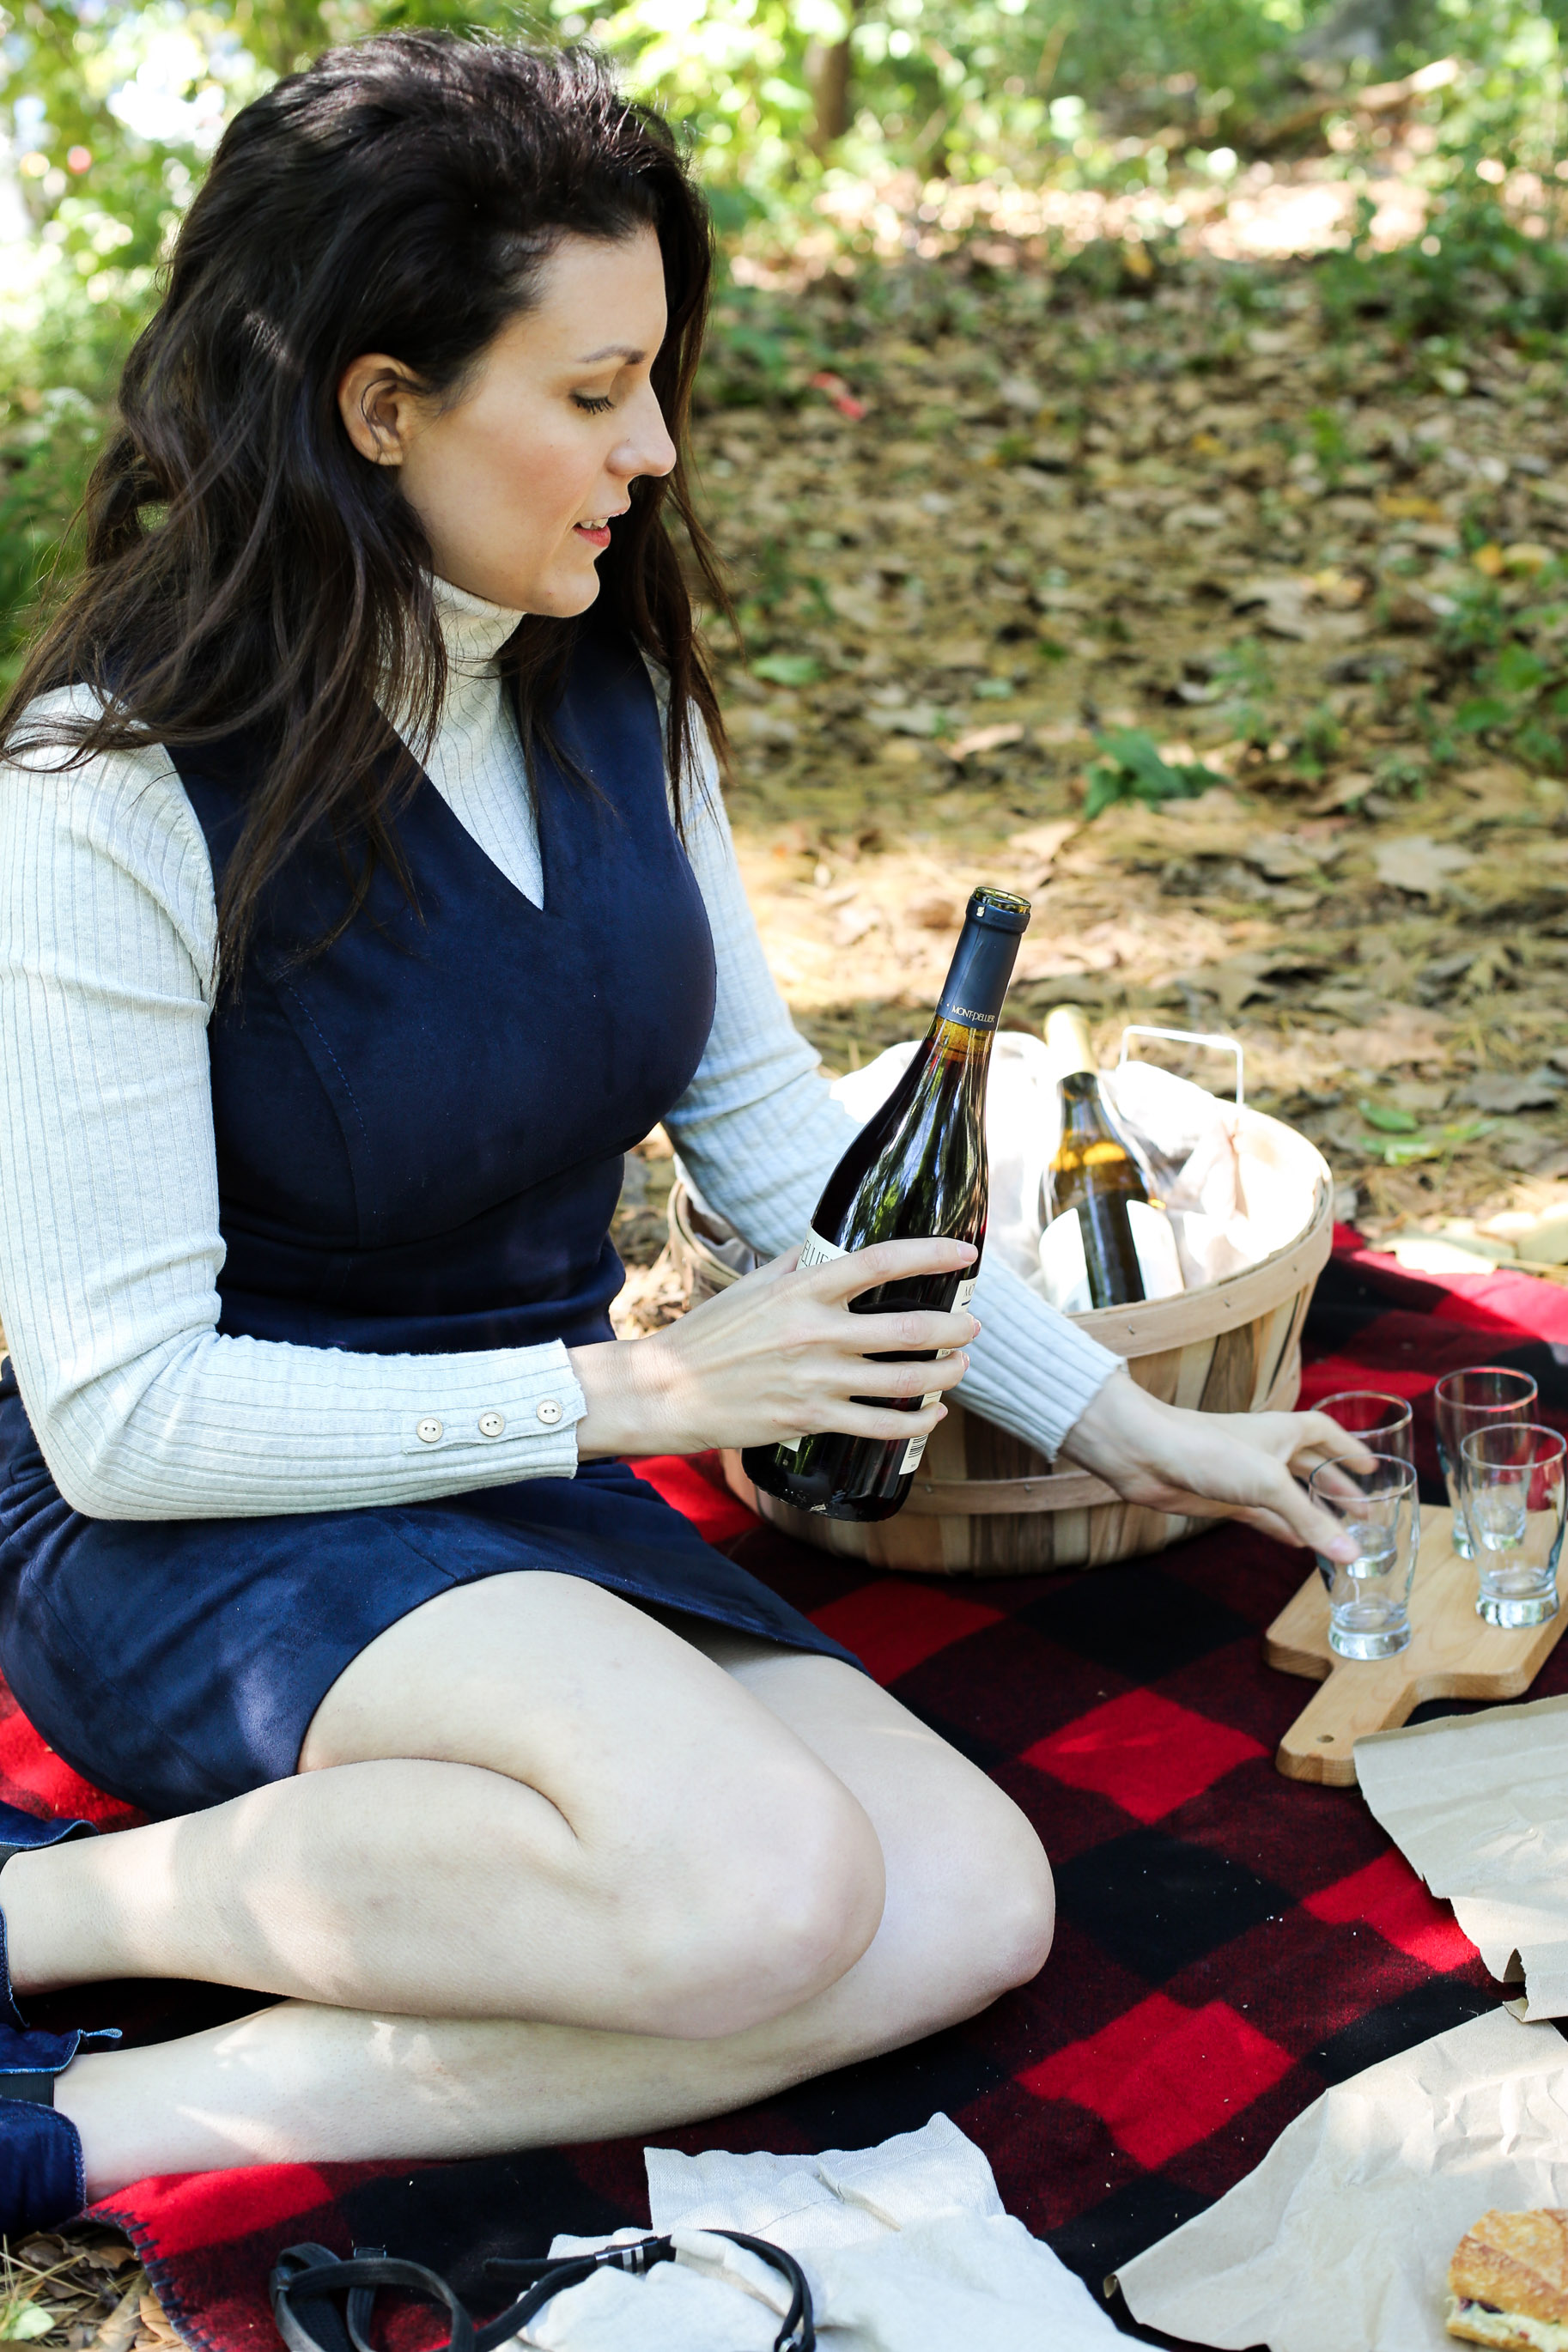 Fall-Wine-Tasting-Picnic9.jpg